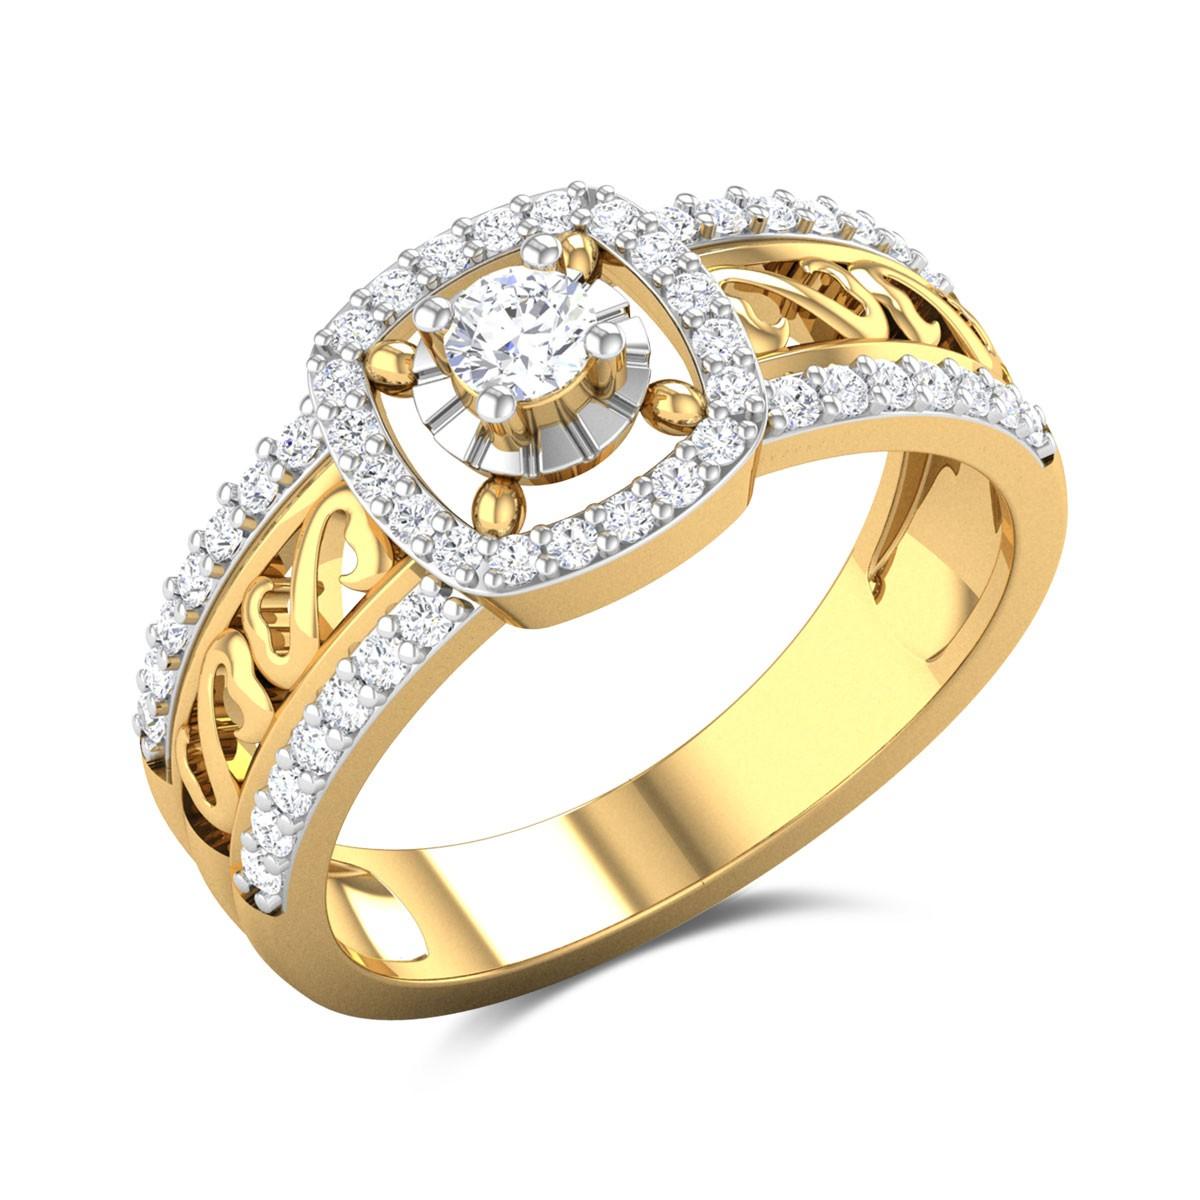 Finola Diamond Royal Ring